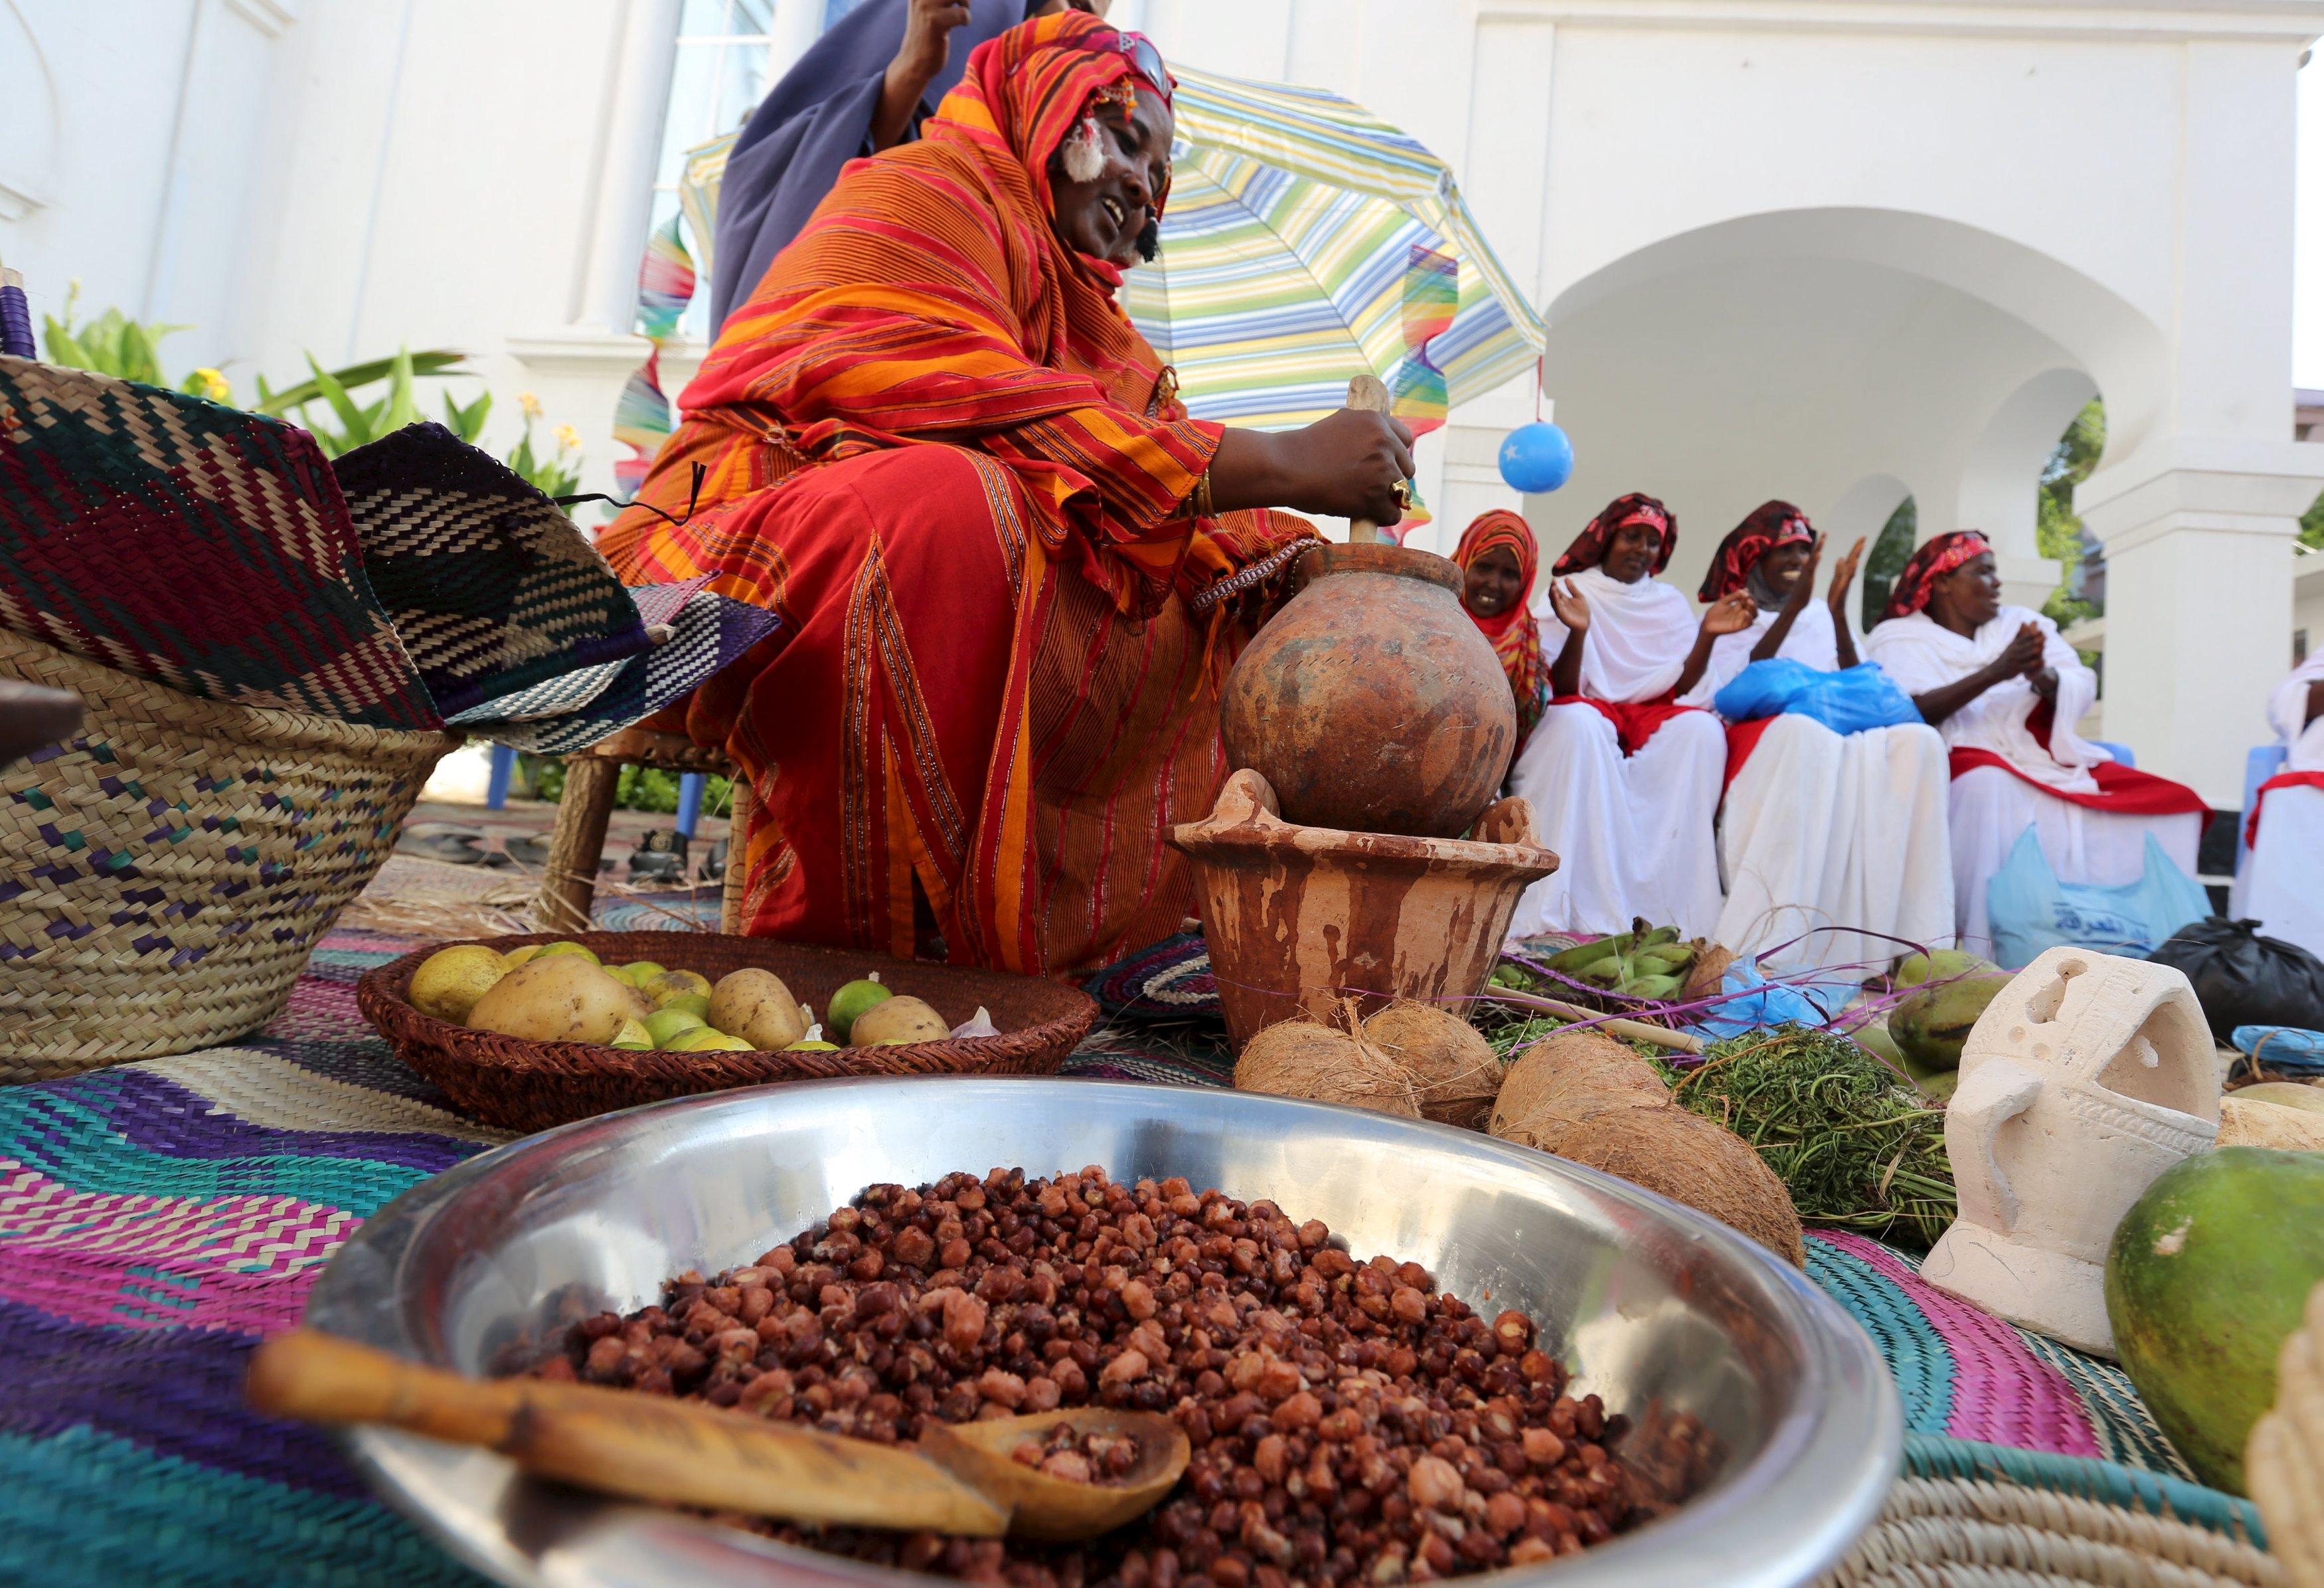 A Peek at Somali Culture